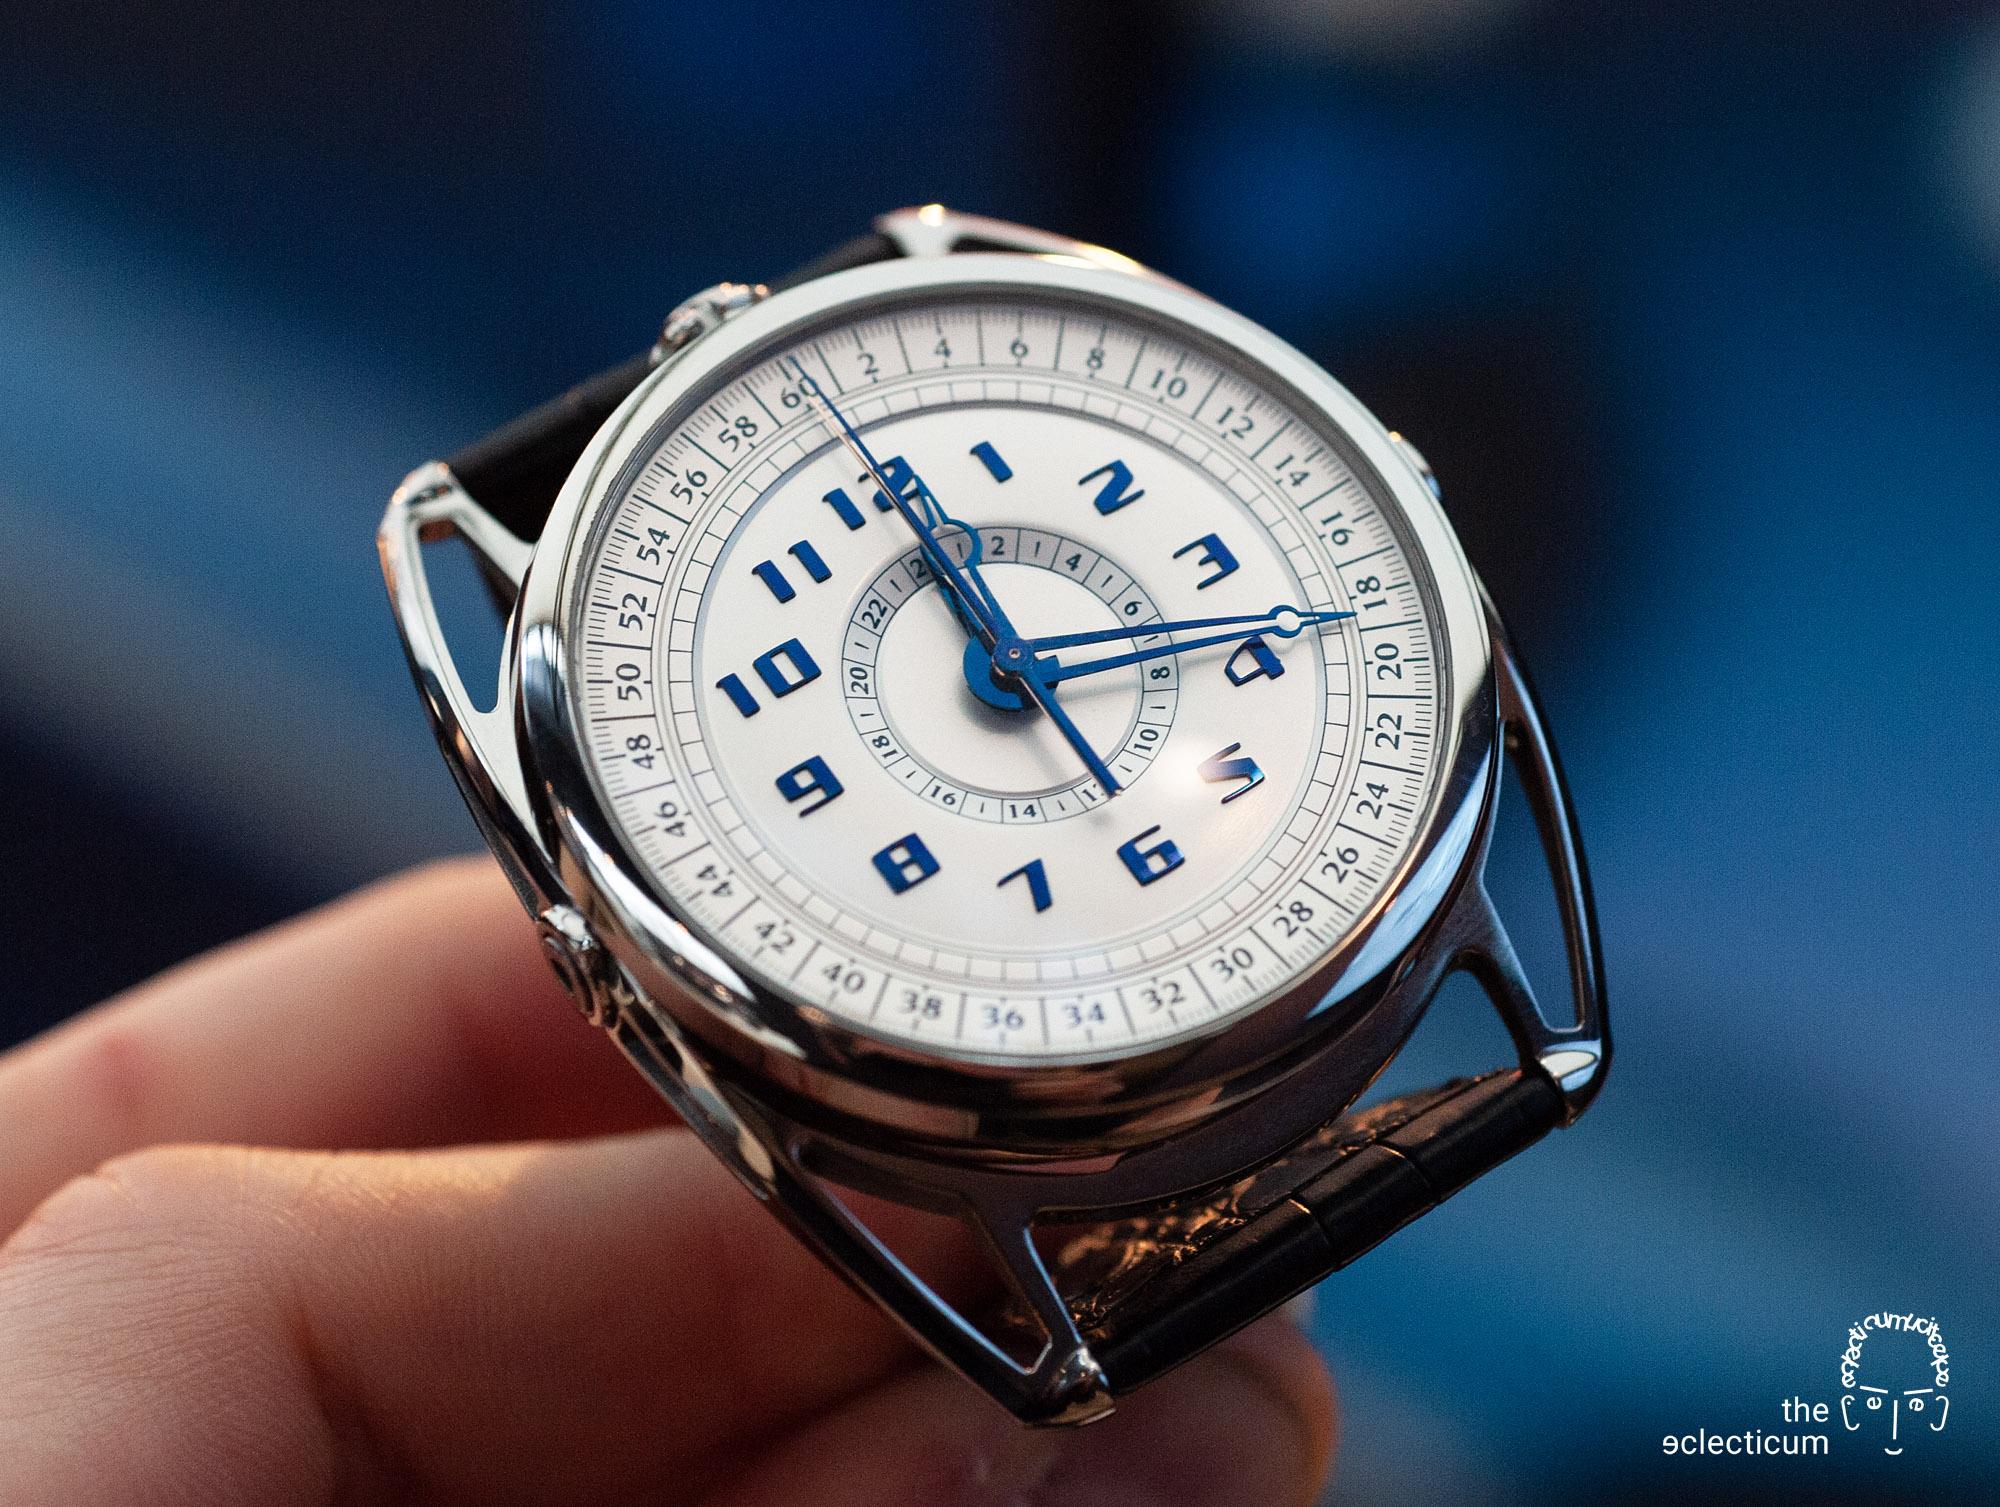 De Bethune DB28 MaxiChrono chronograph central stack manufacture